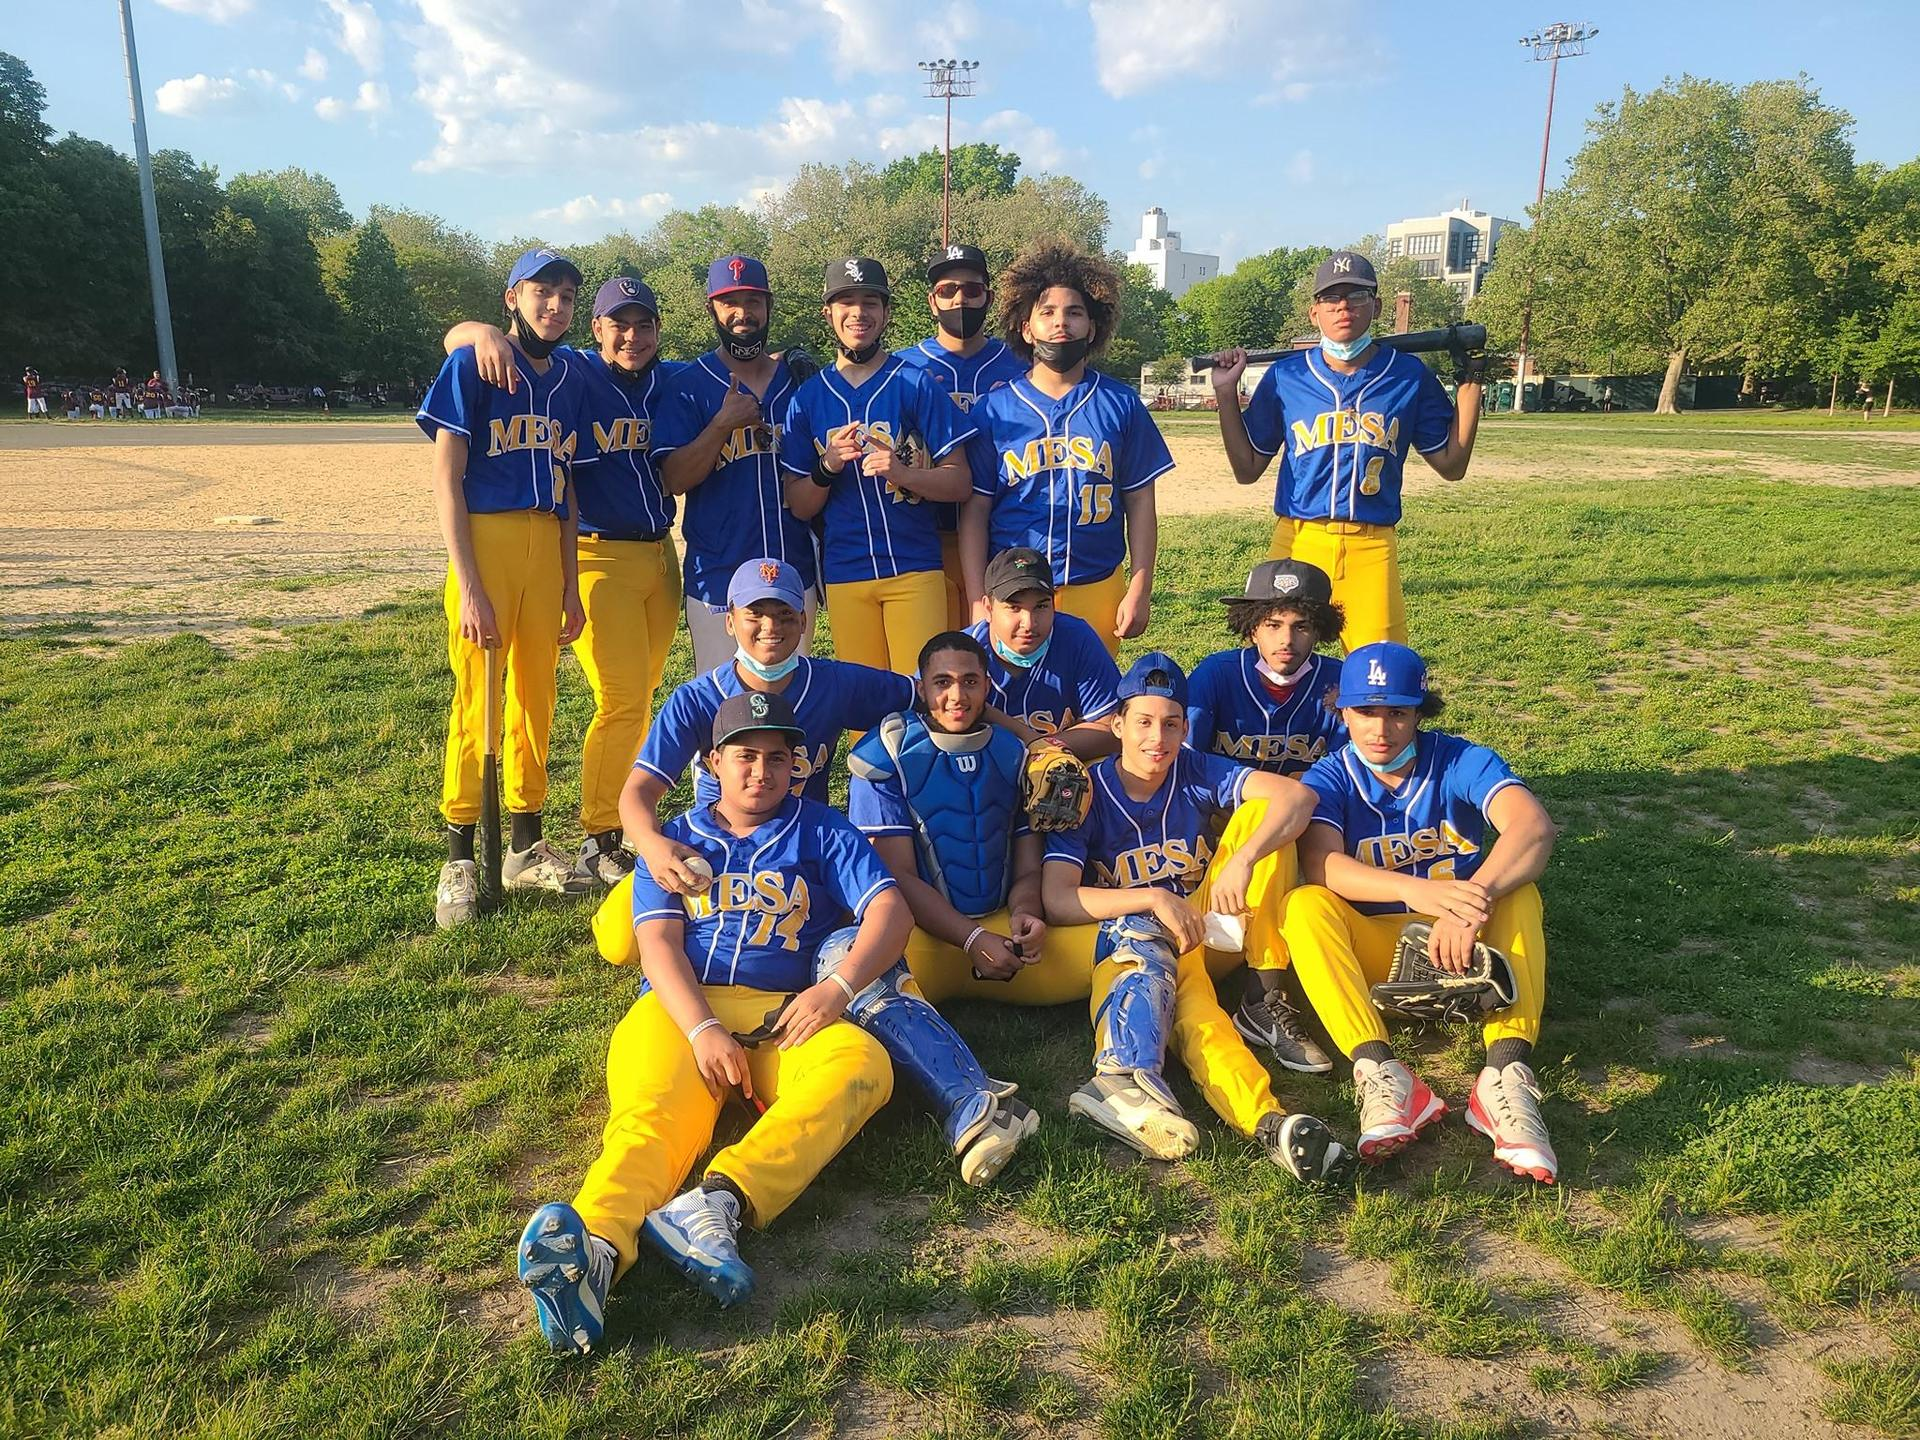 baseball team in the field